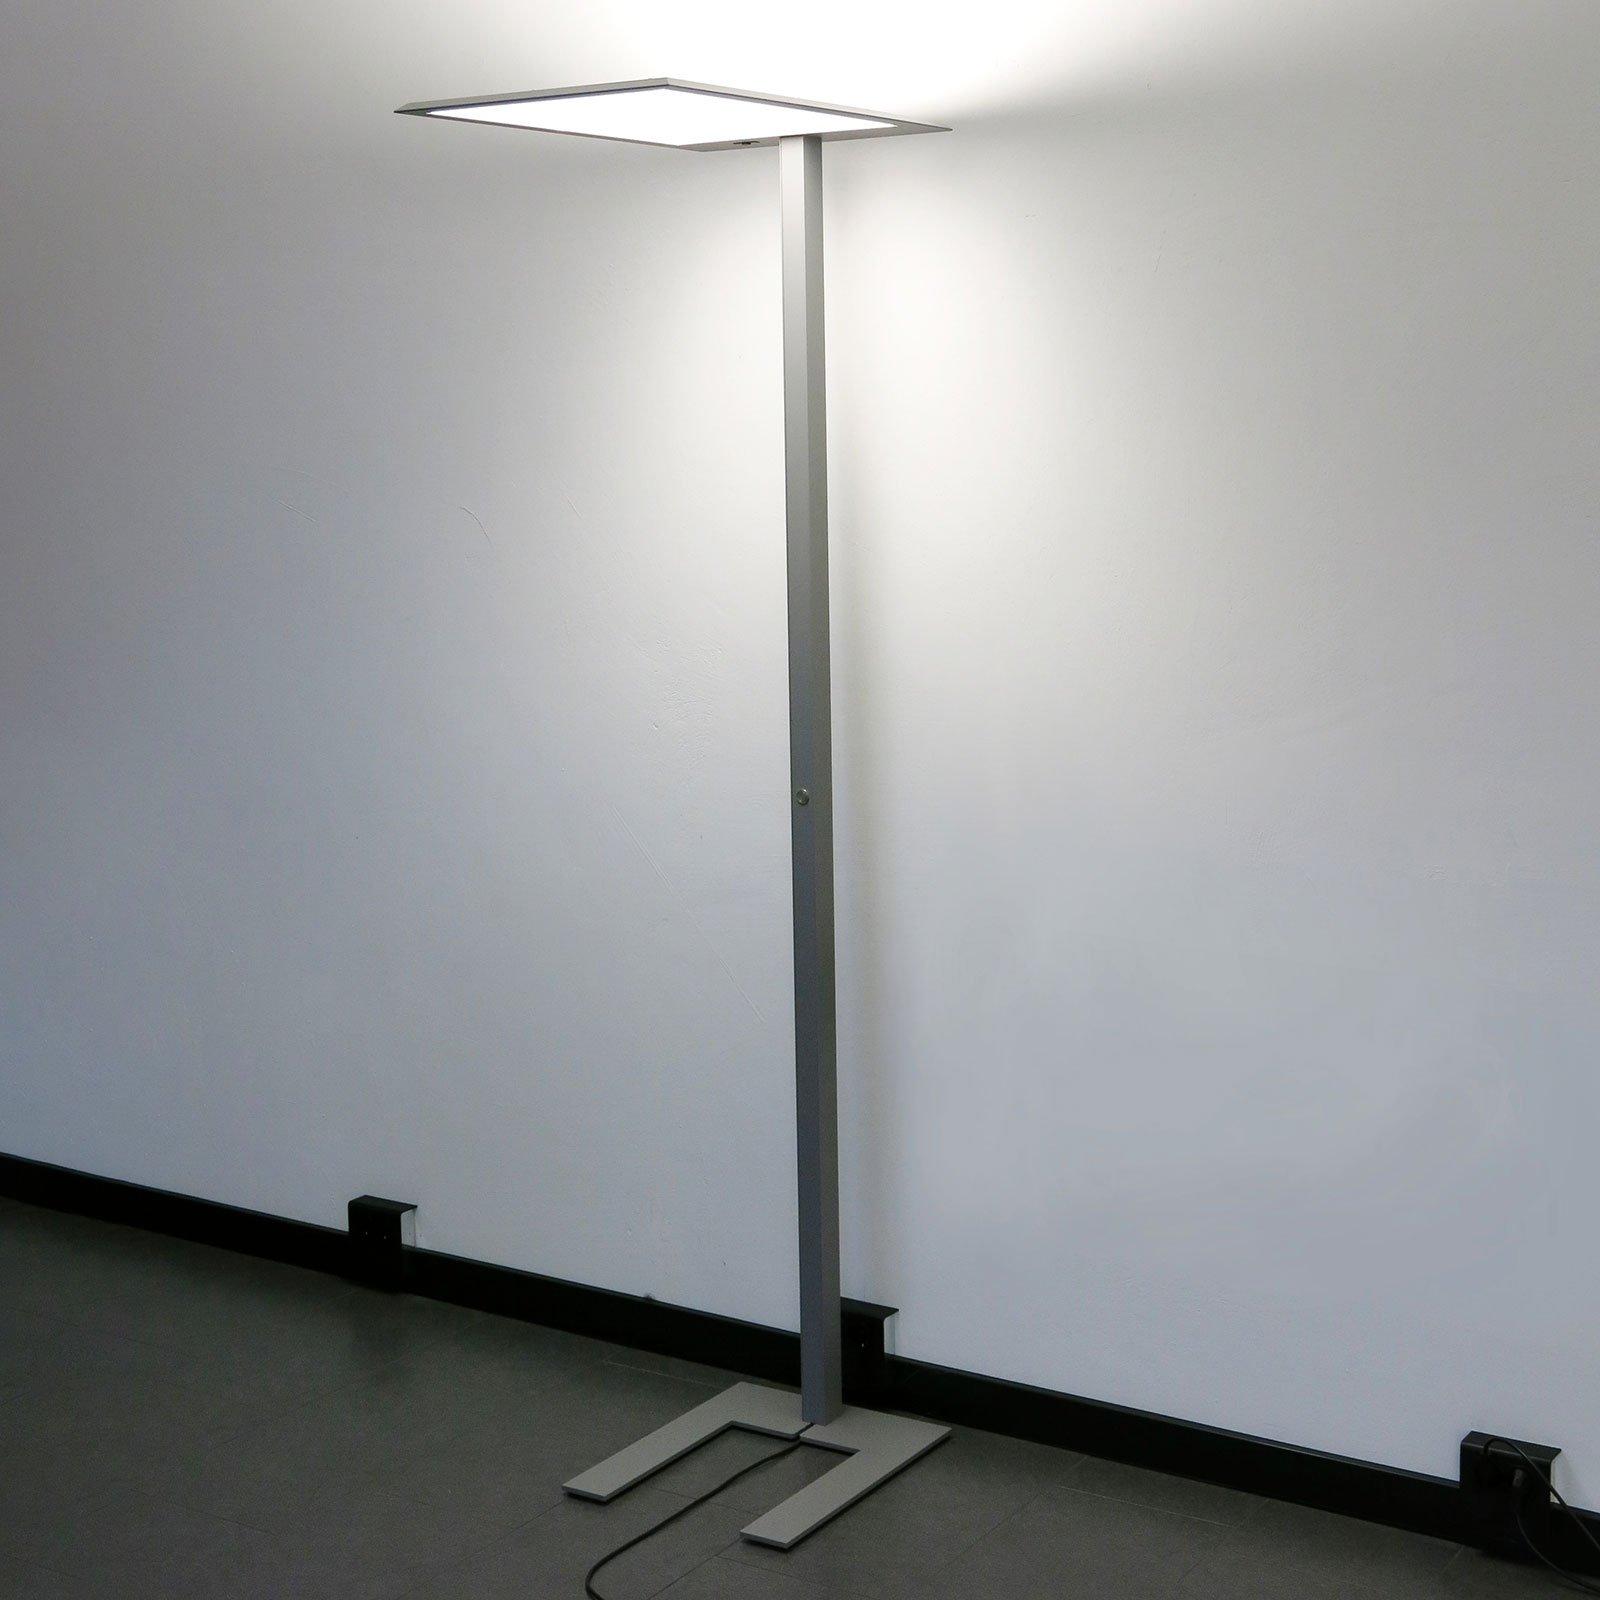 LEAS LED-gulvlampe, 203 cm, titan, bryter